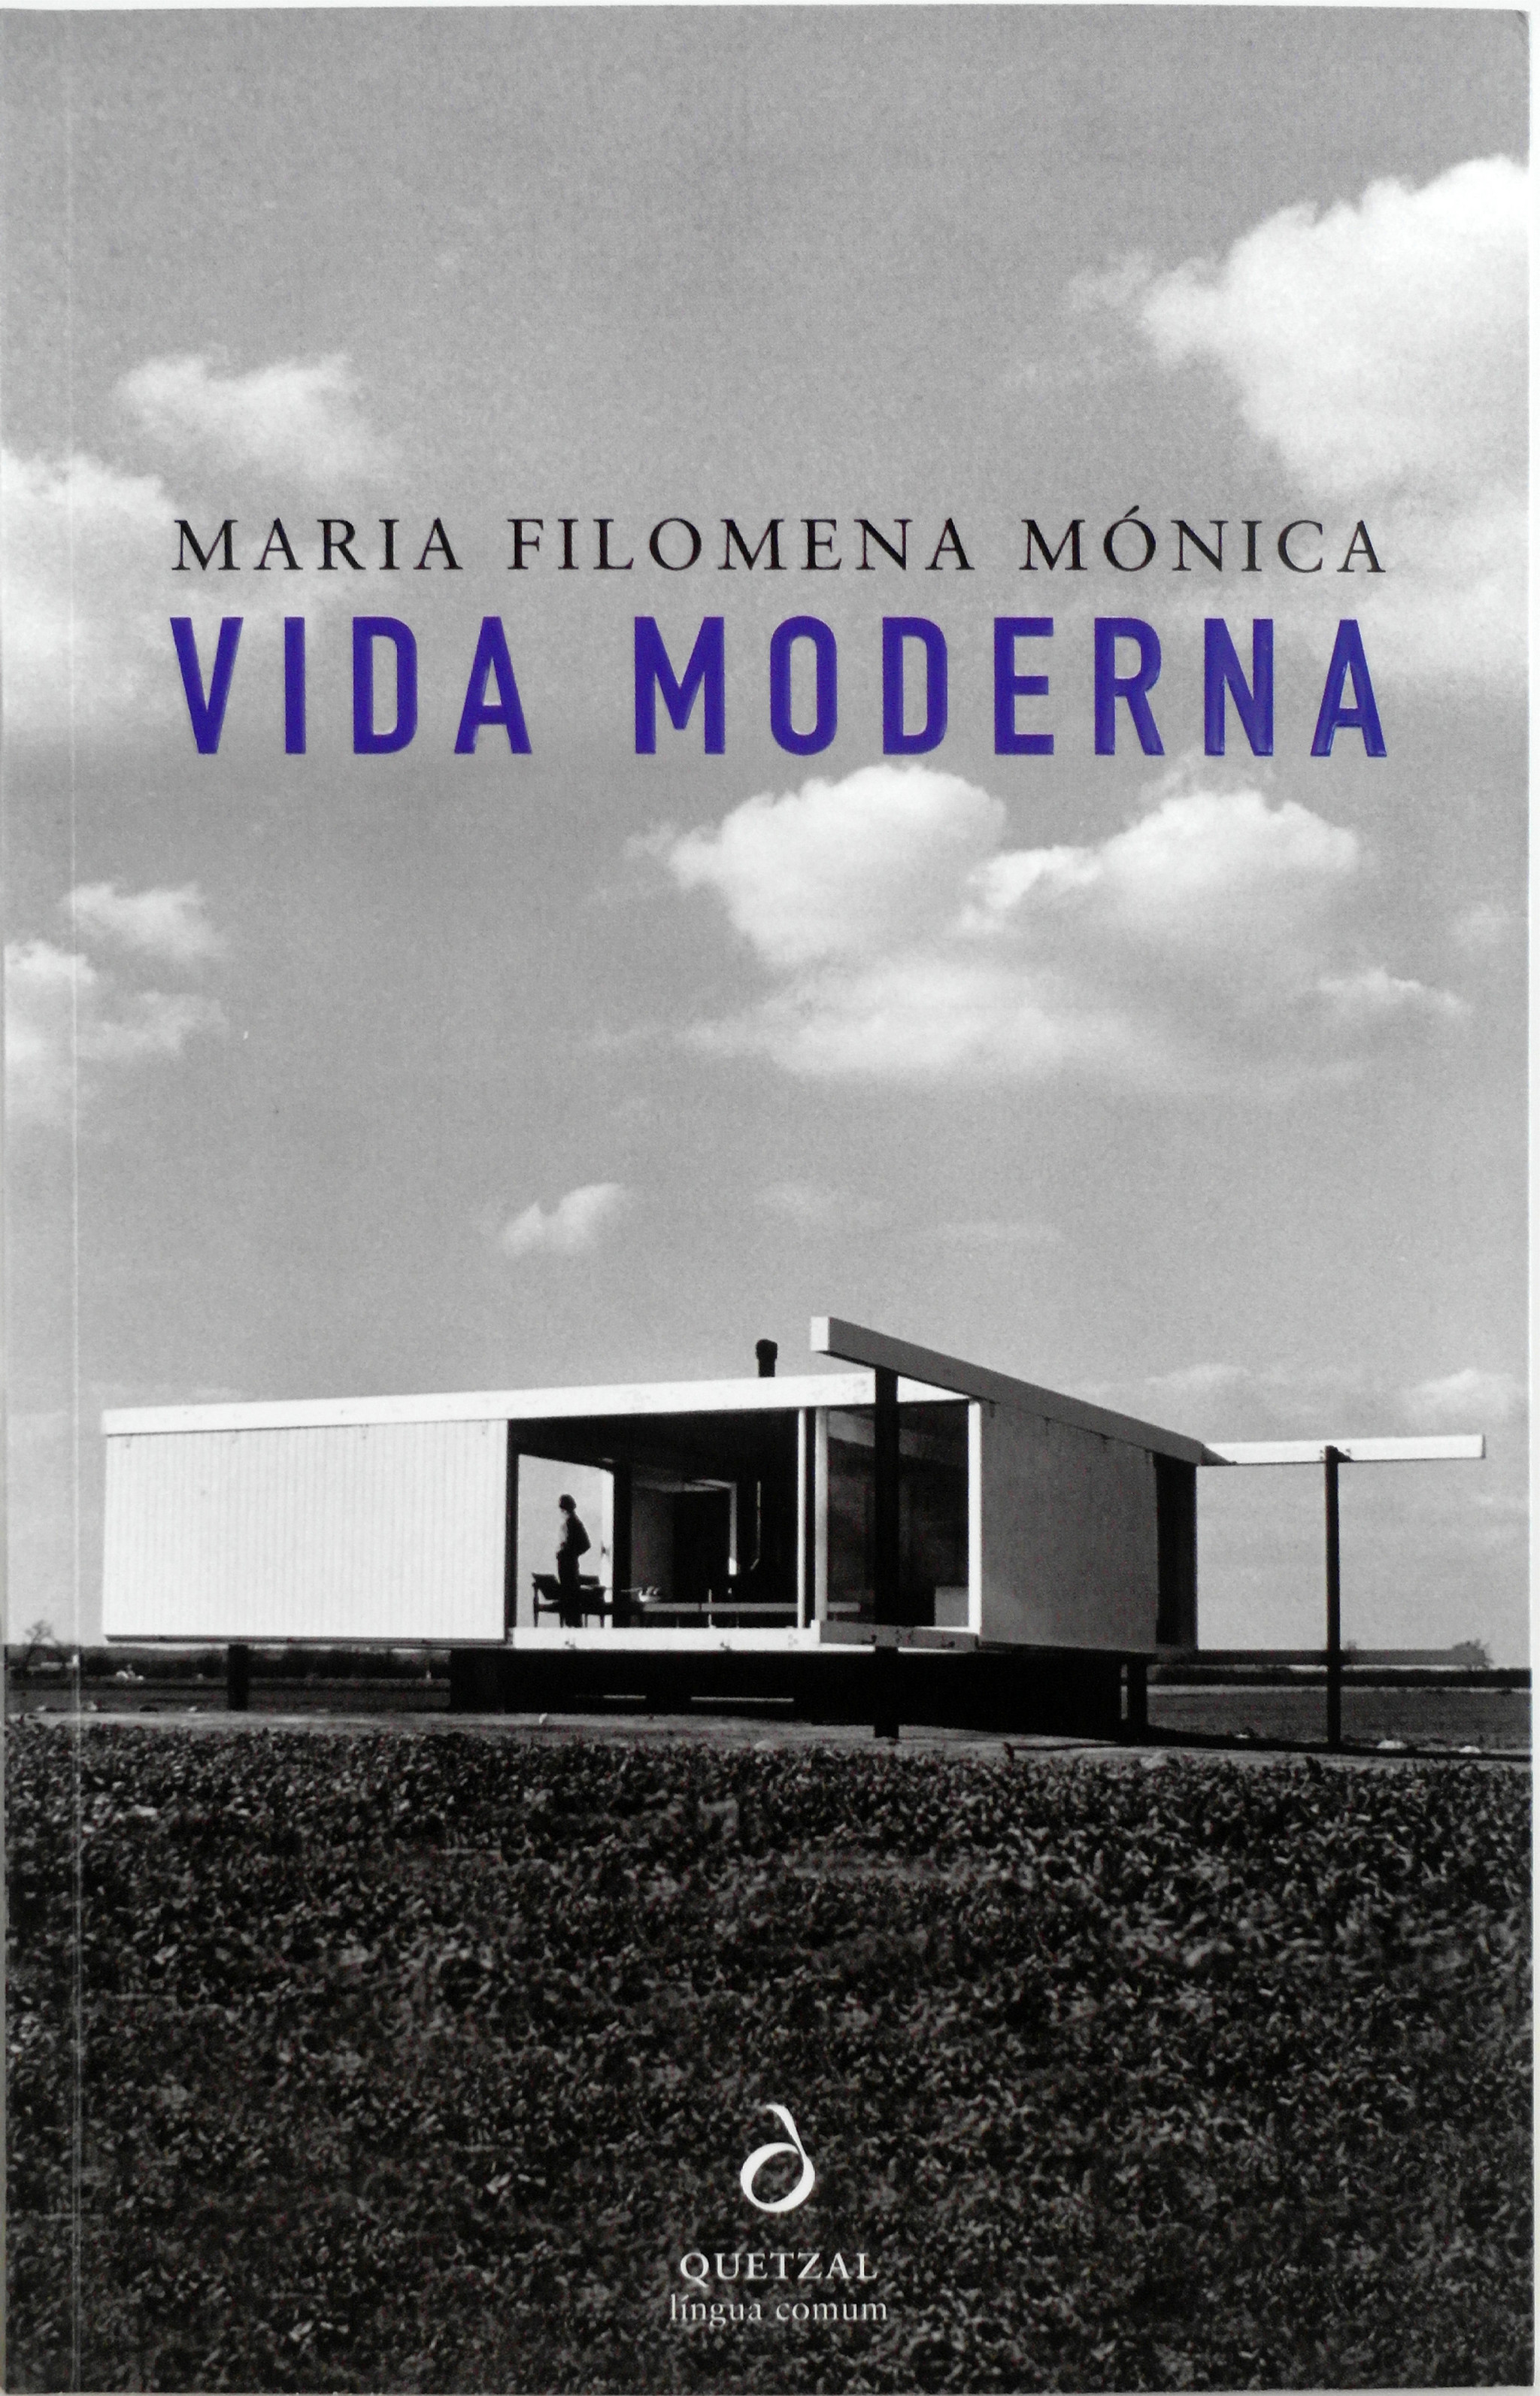 Livro Vida moderna 01.JPG